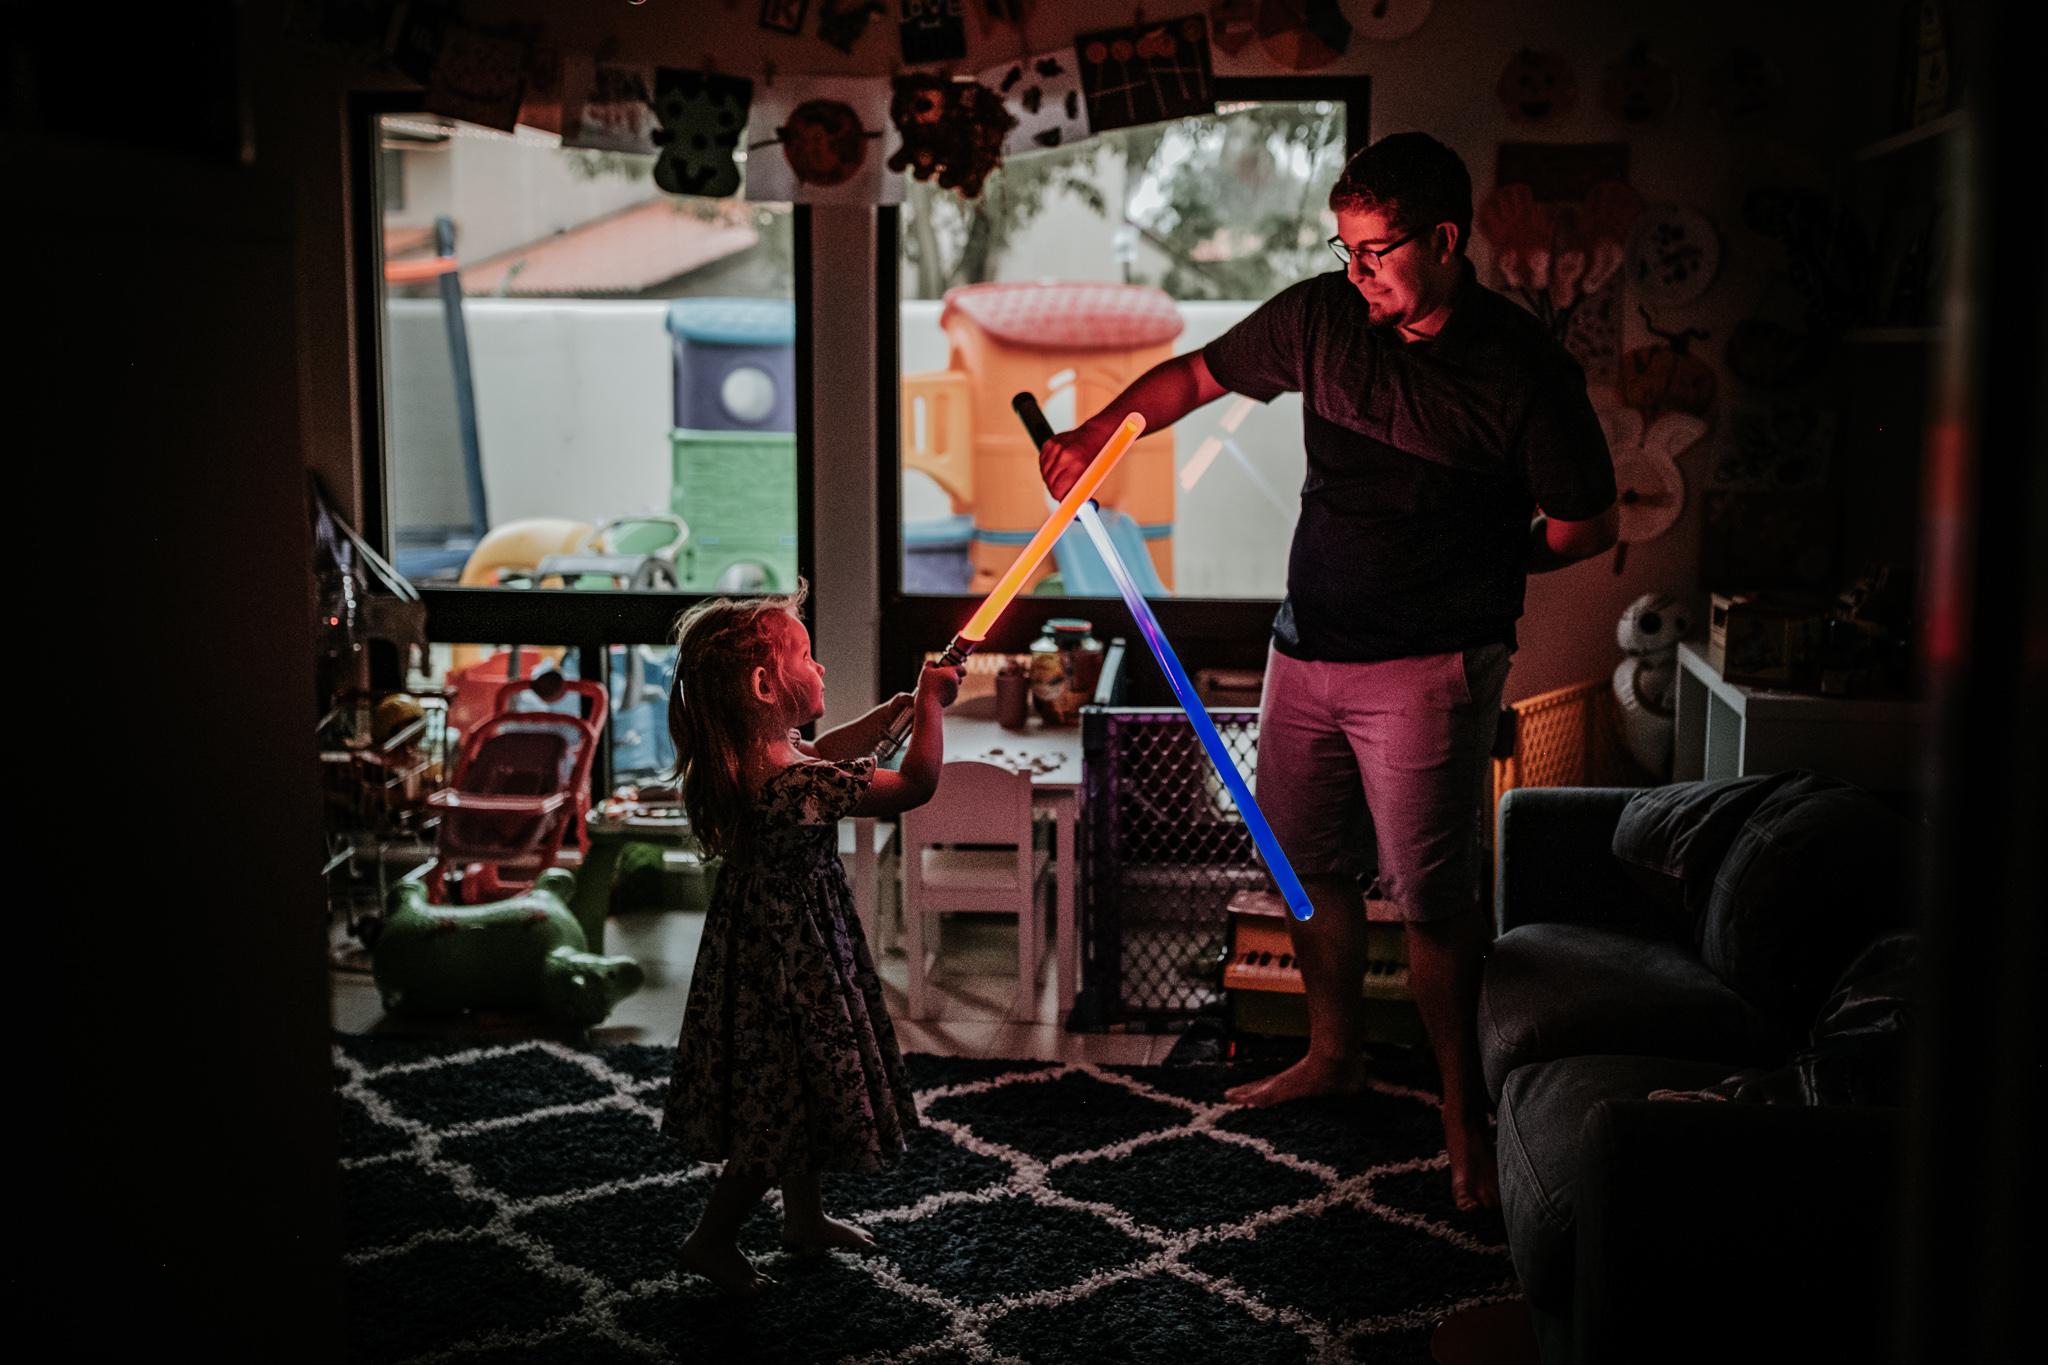 Epic light saber battle to end the morning